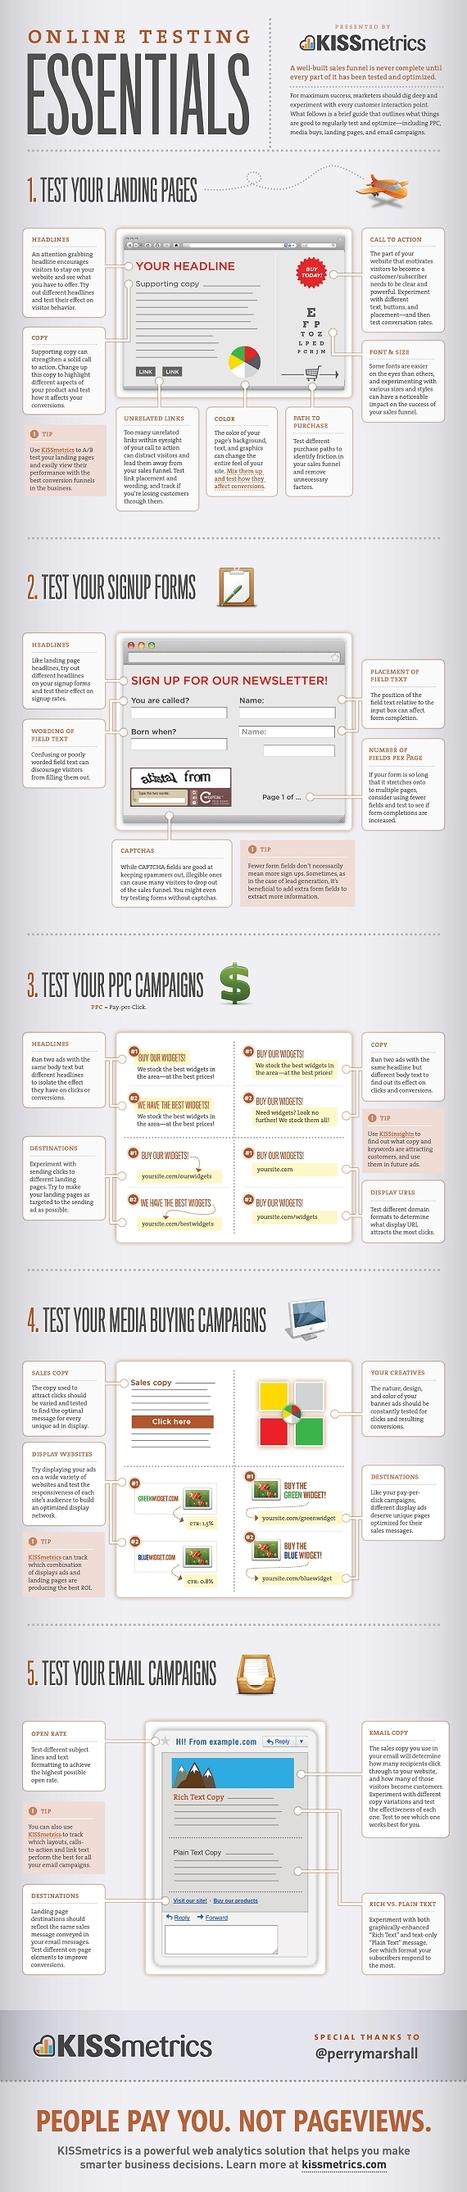 Online Testing Essentials: An infographic on what online marketing activities to test. | FastStart | Scoop.it